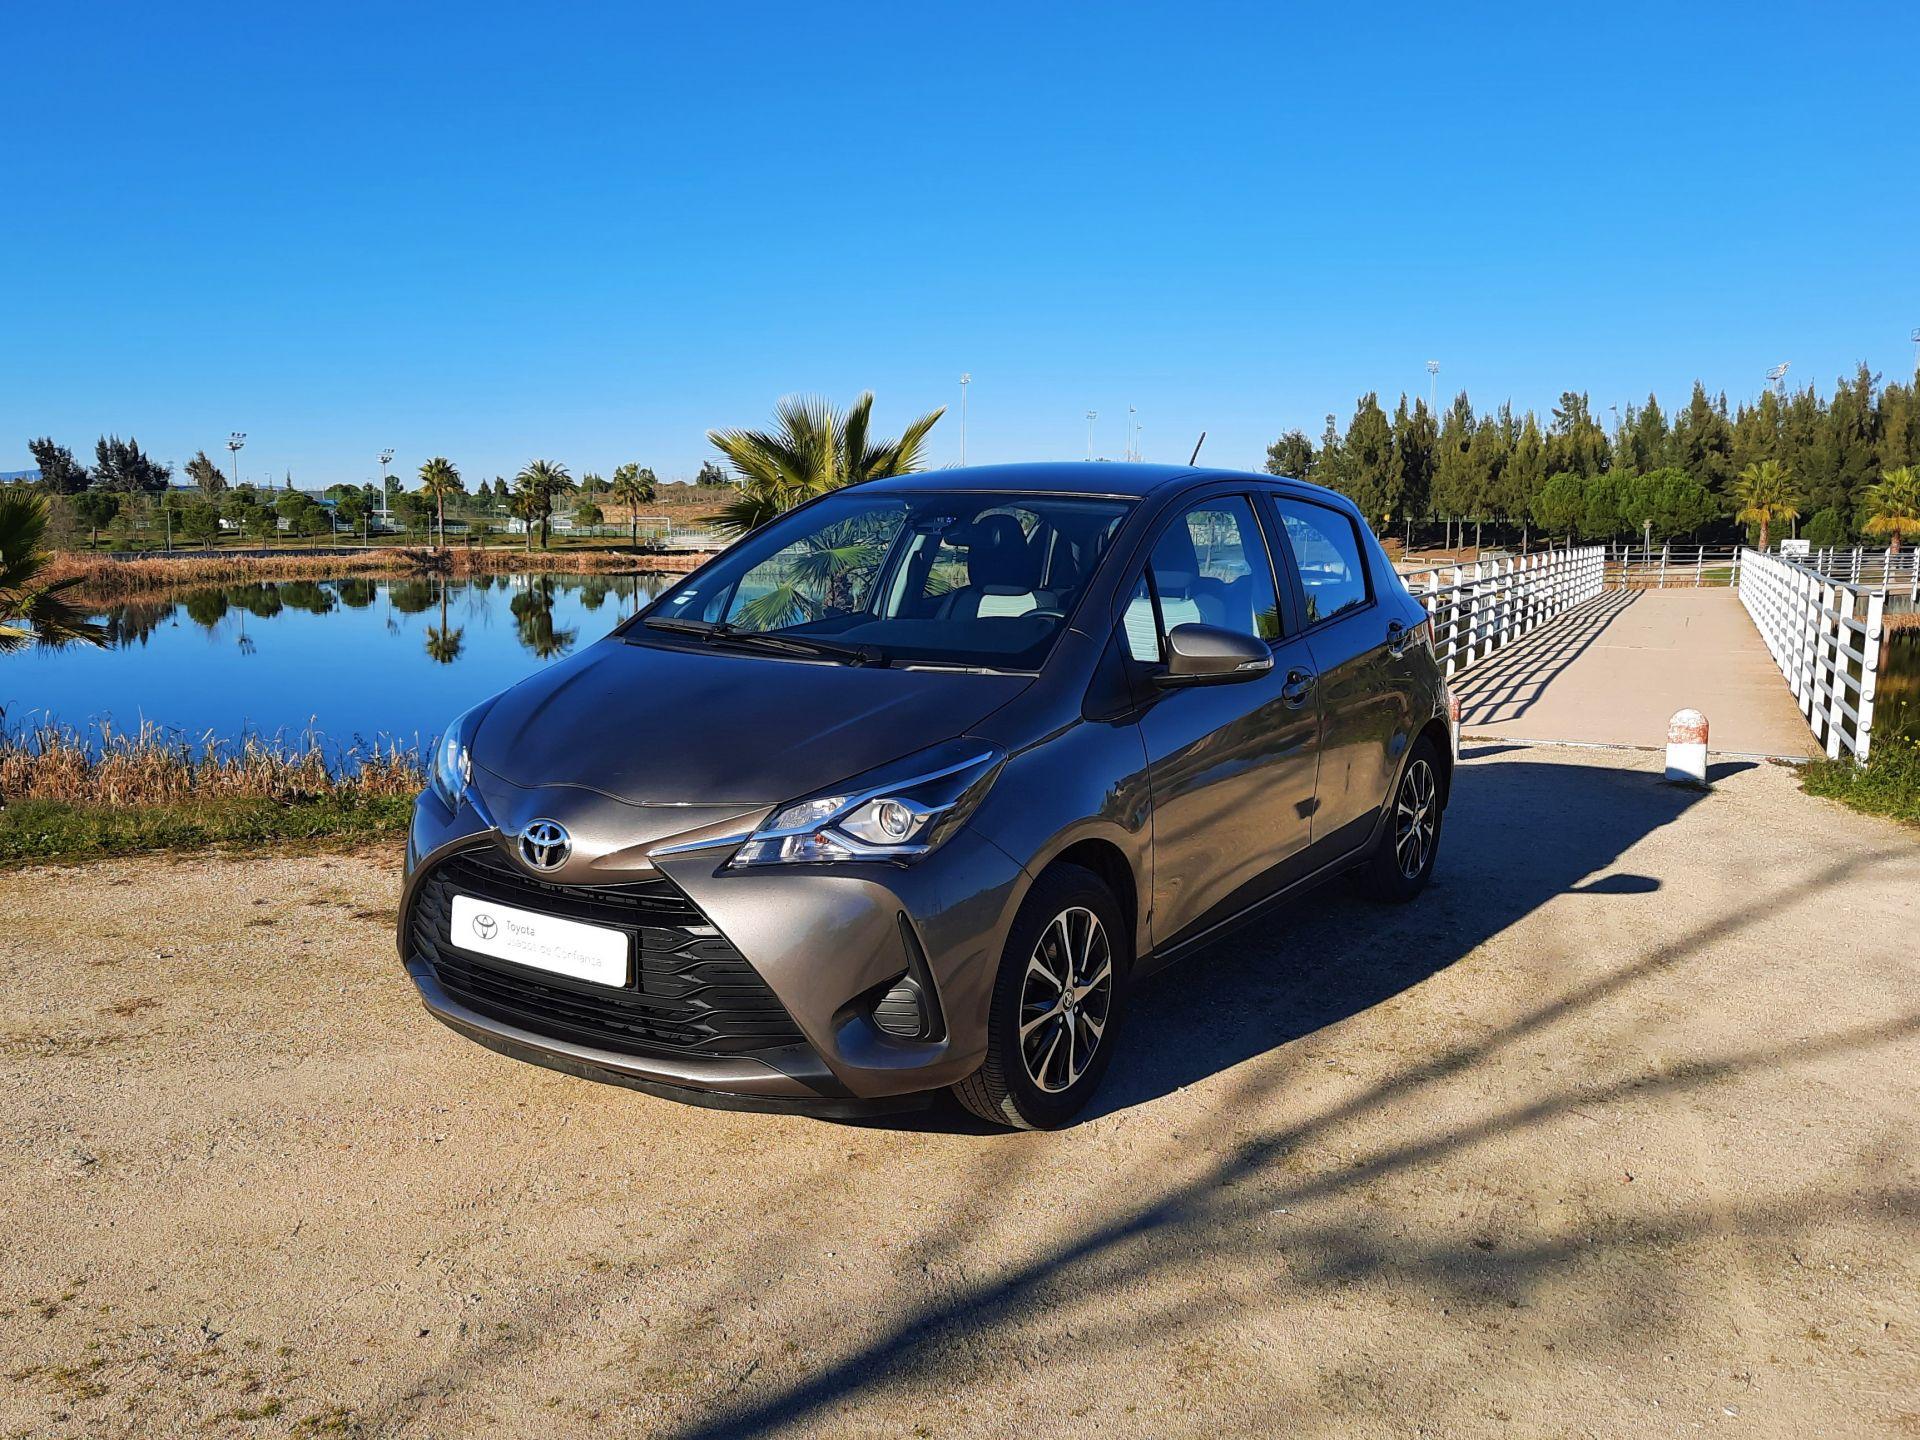 Toyota Yaris 1.0 Comfort usada Castelo Branco